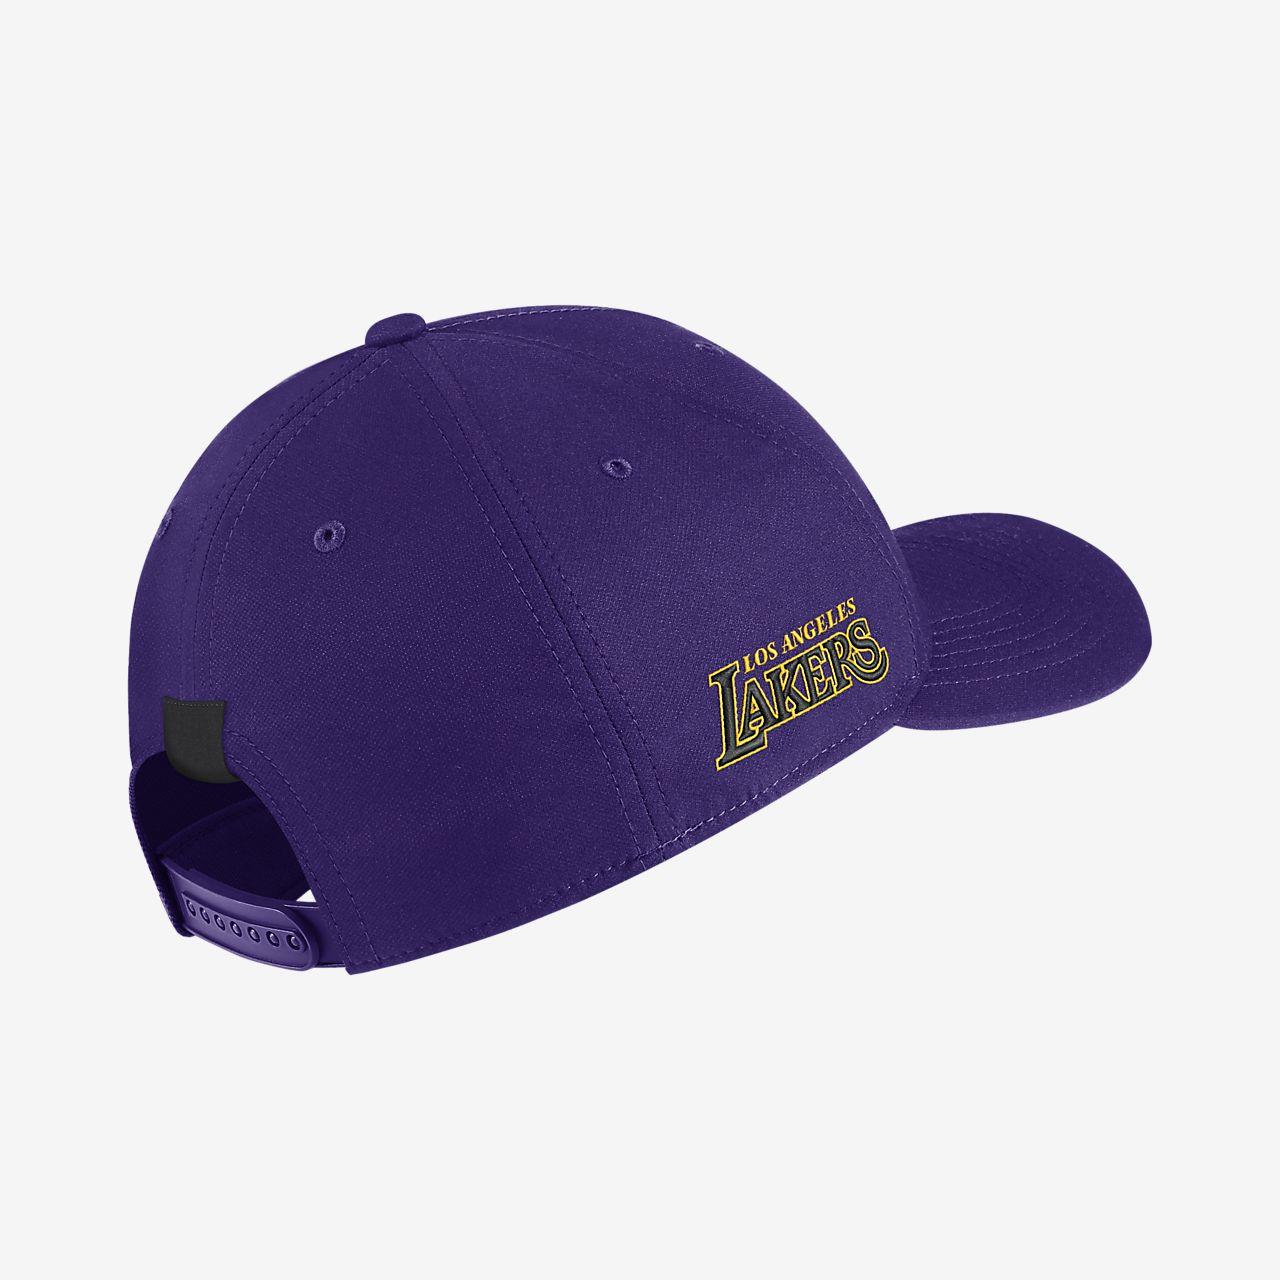 ae7623fa4 Los Angeles Lakers City Edition Nike AeroBill Classic99 NBA Hat ...